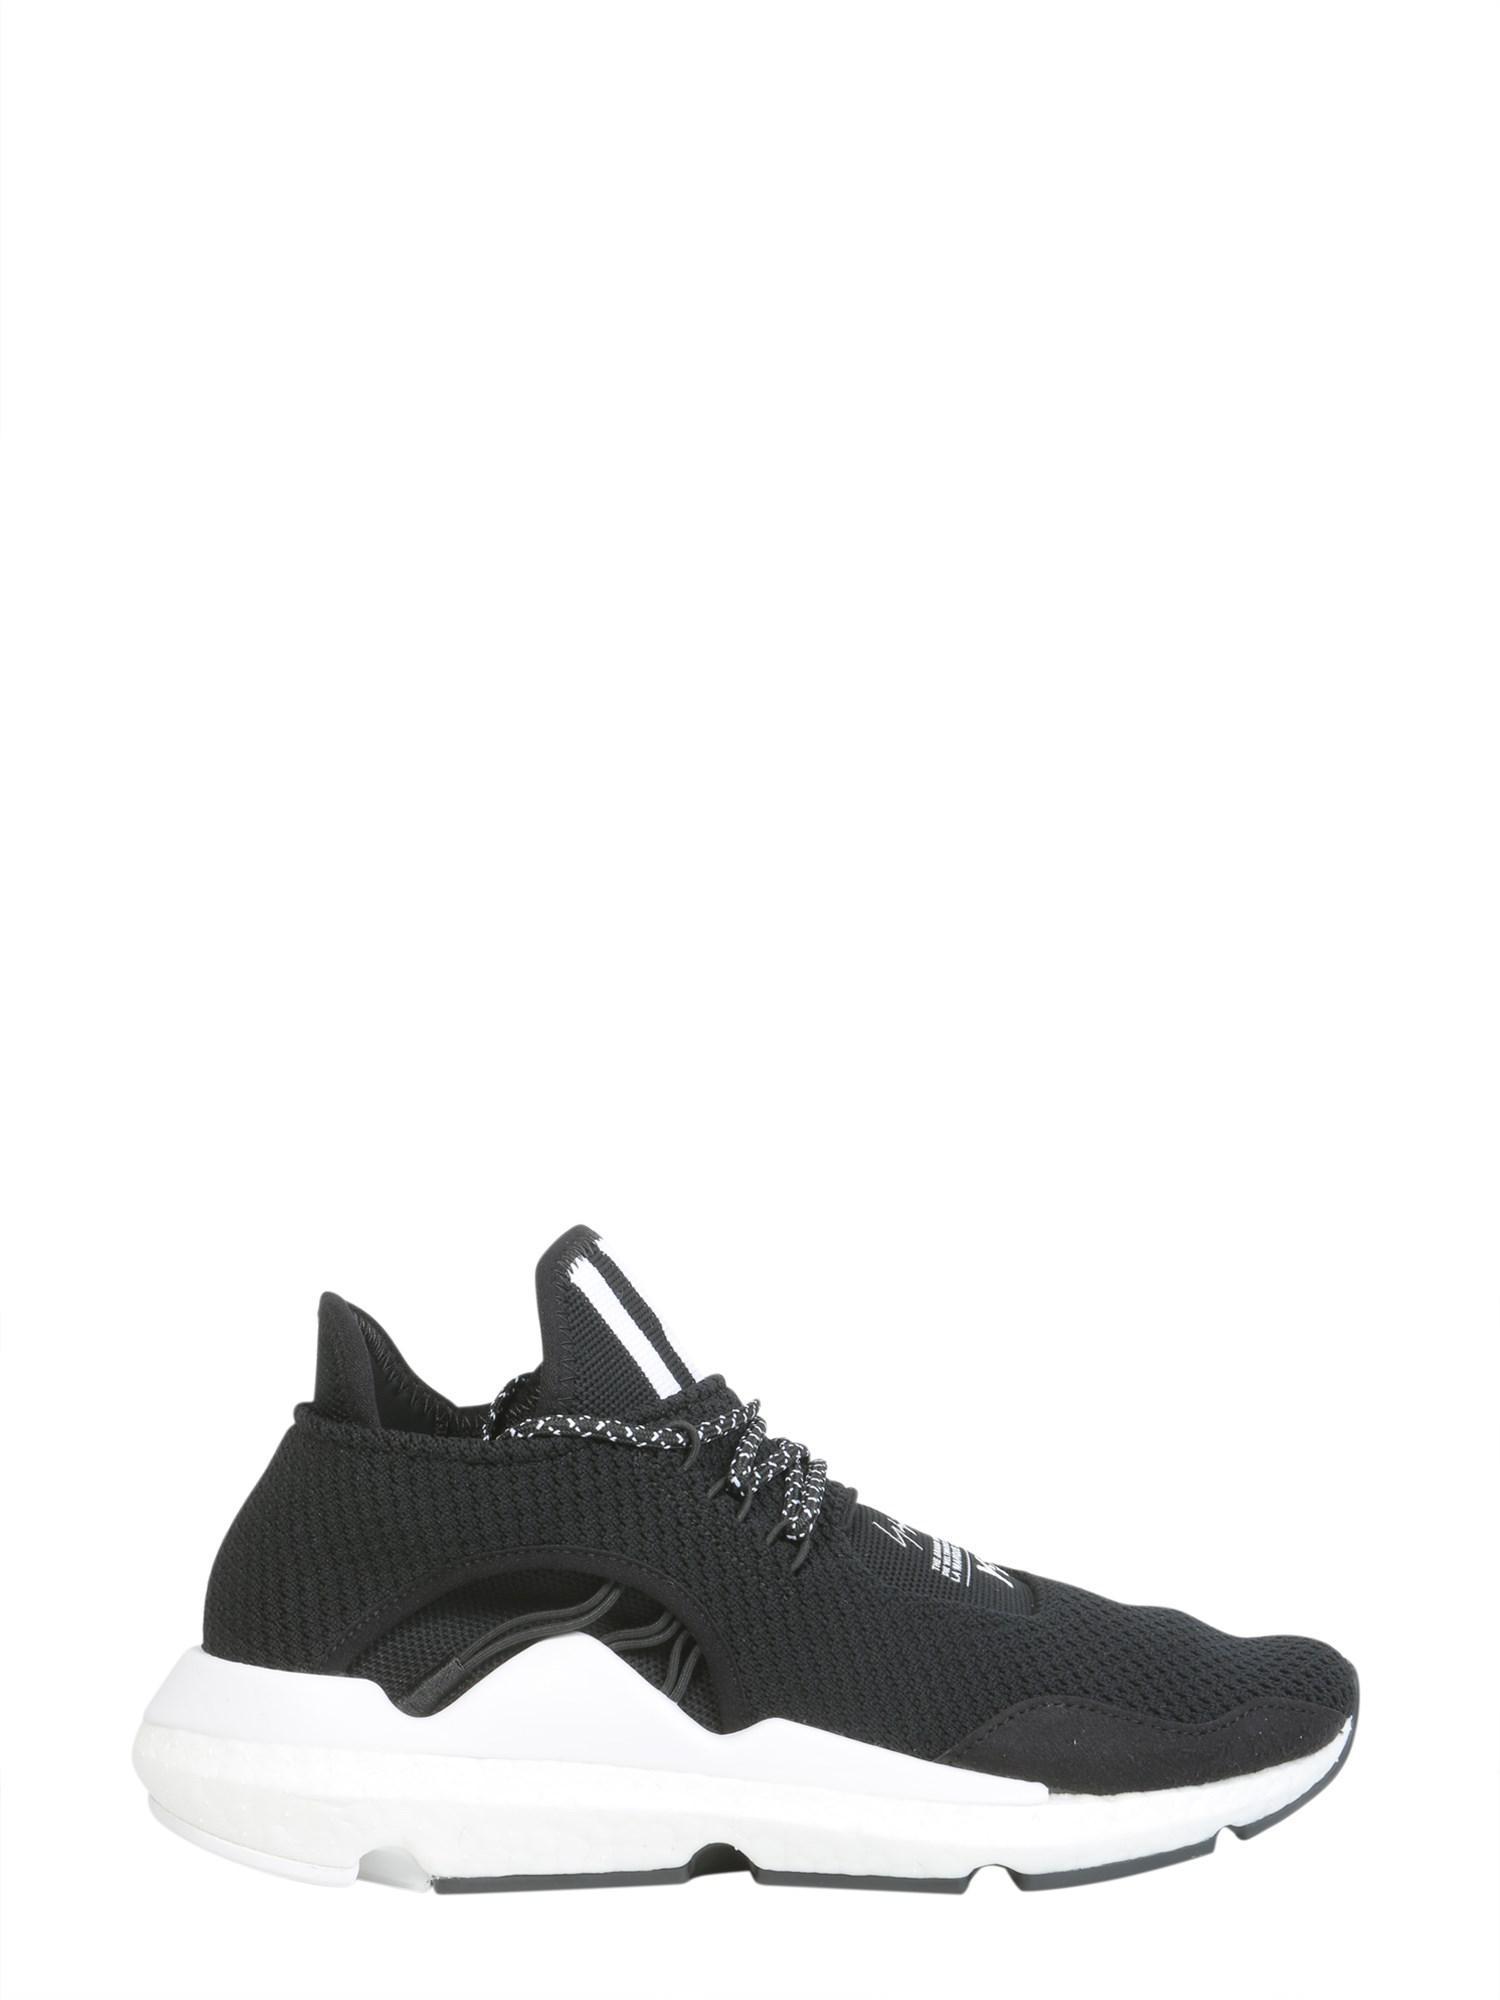 3f0bda1af Lyst - Y-3 Sneaker Saikou Con Suola Pure Boost in Black